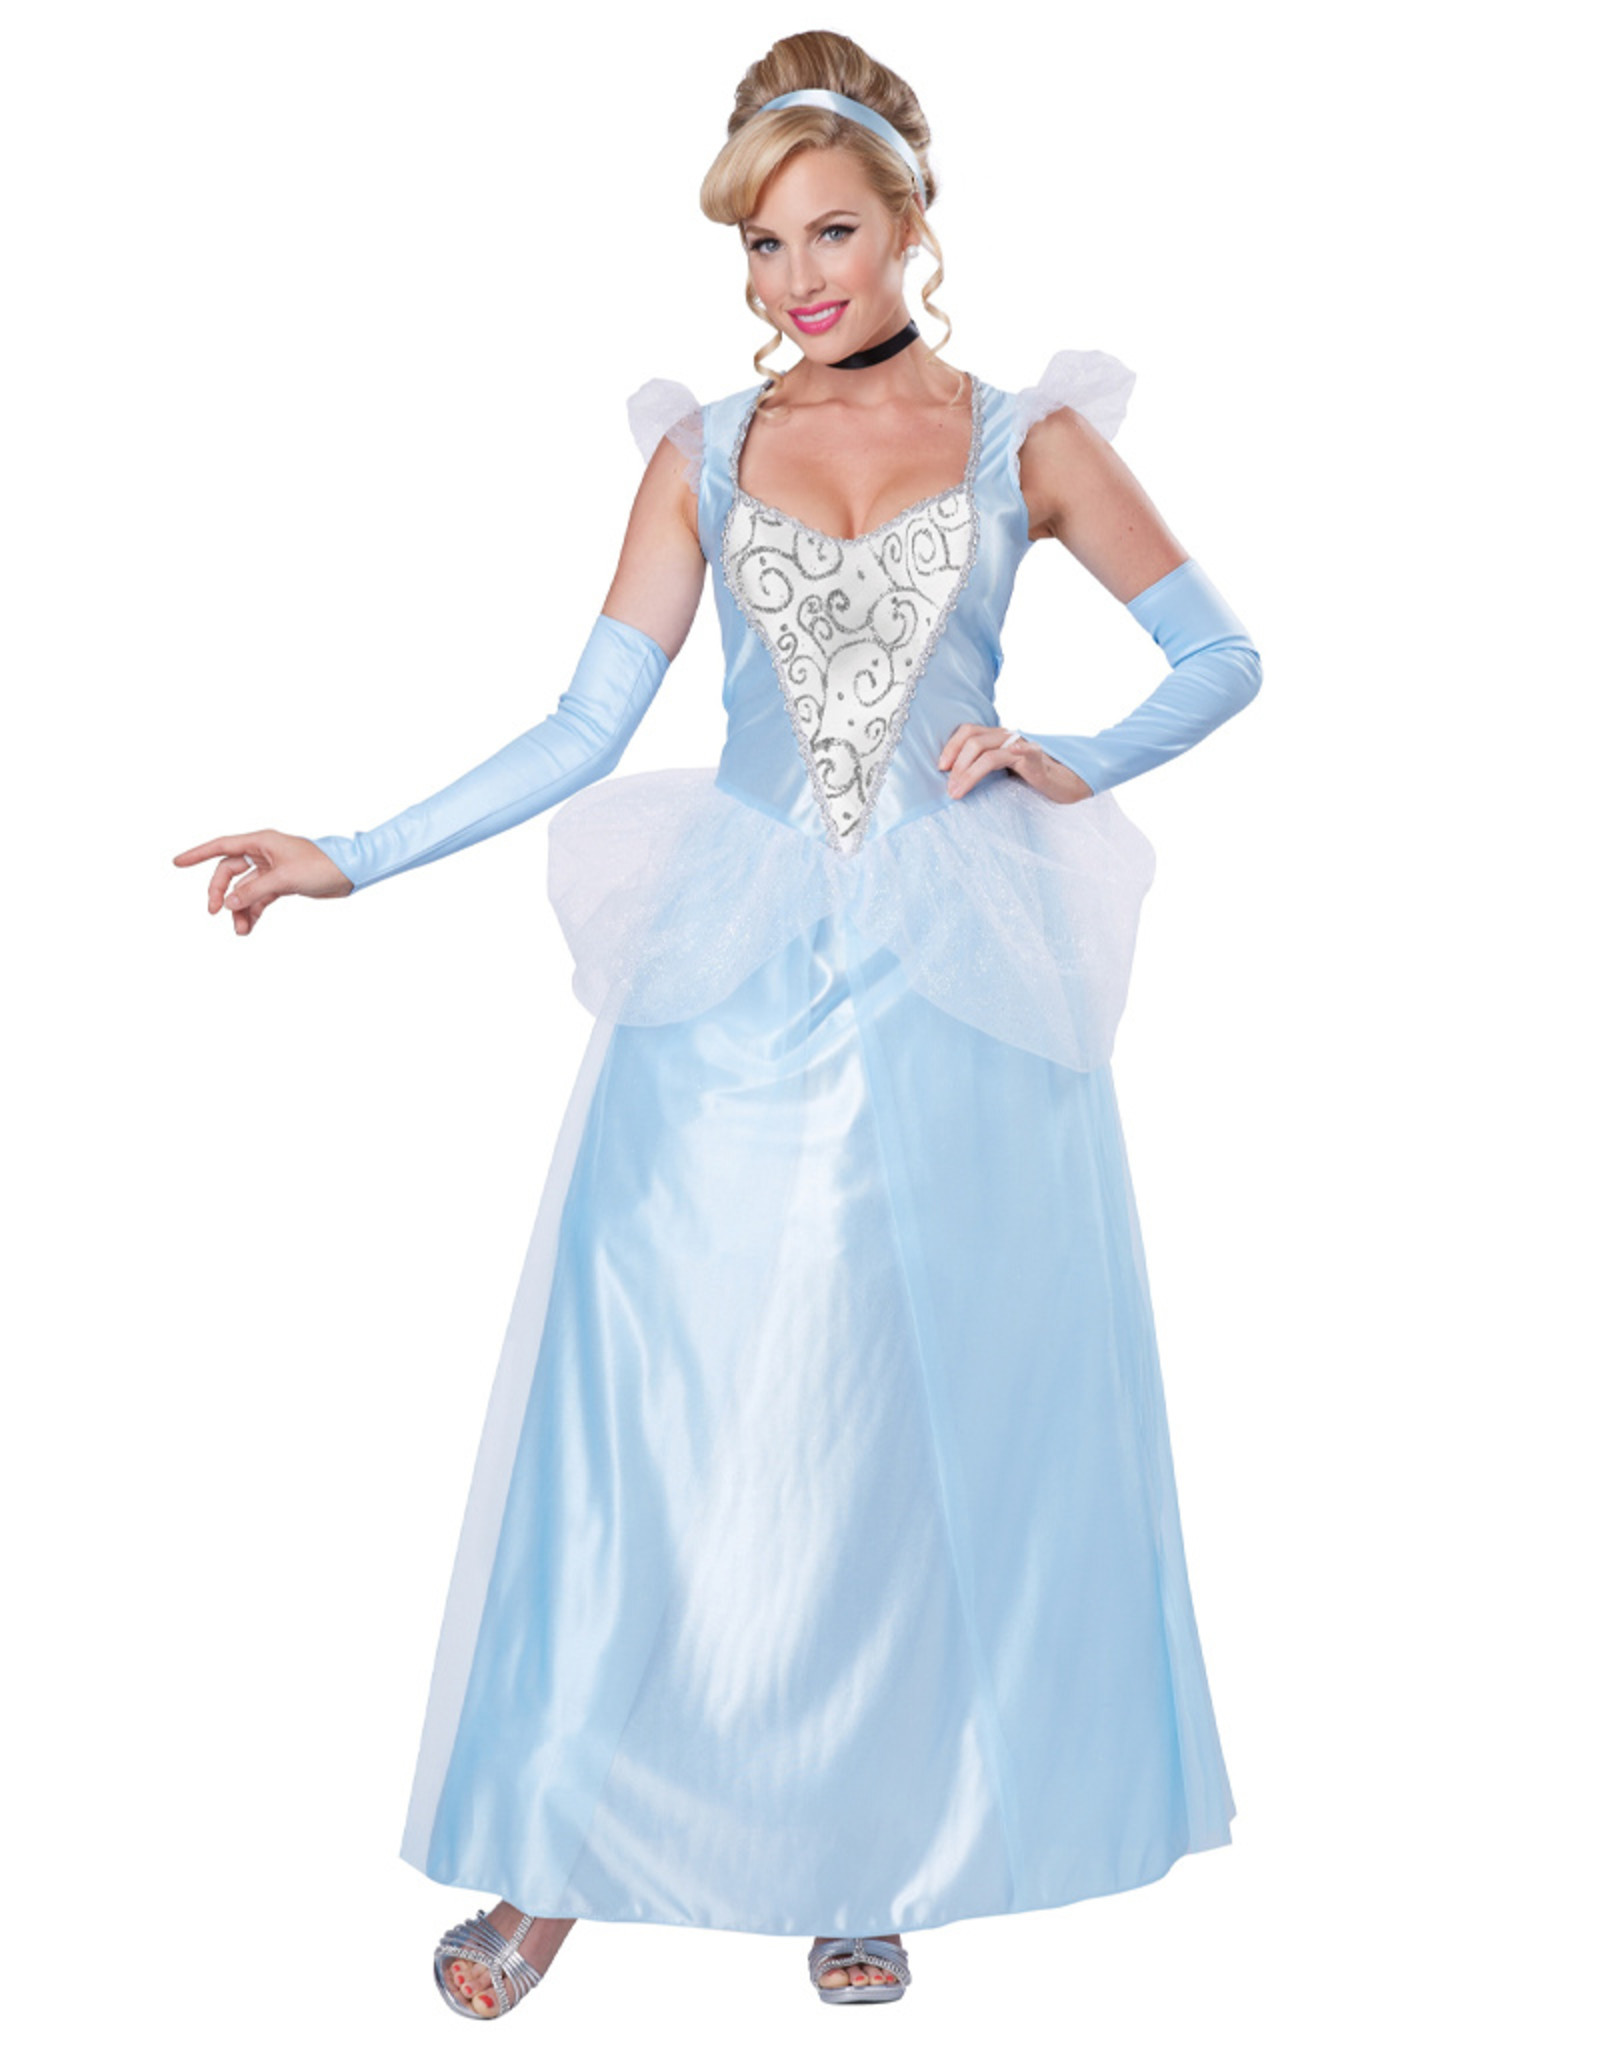 Classic Cinderella Costume - Women's